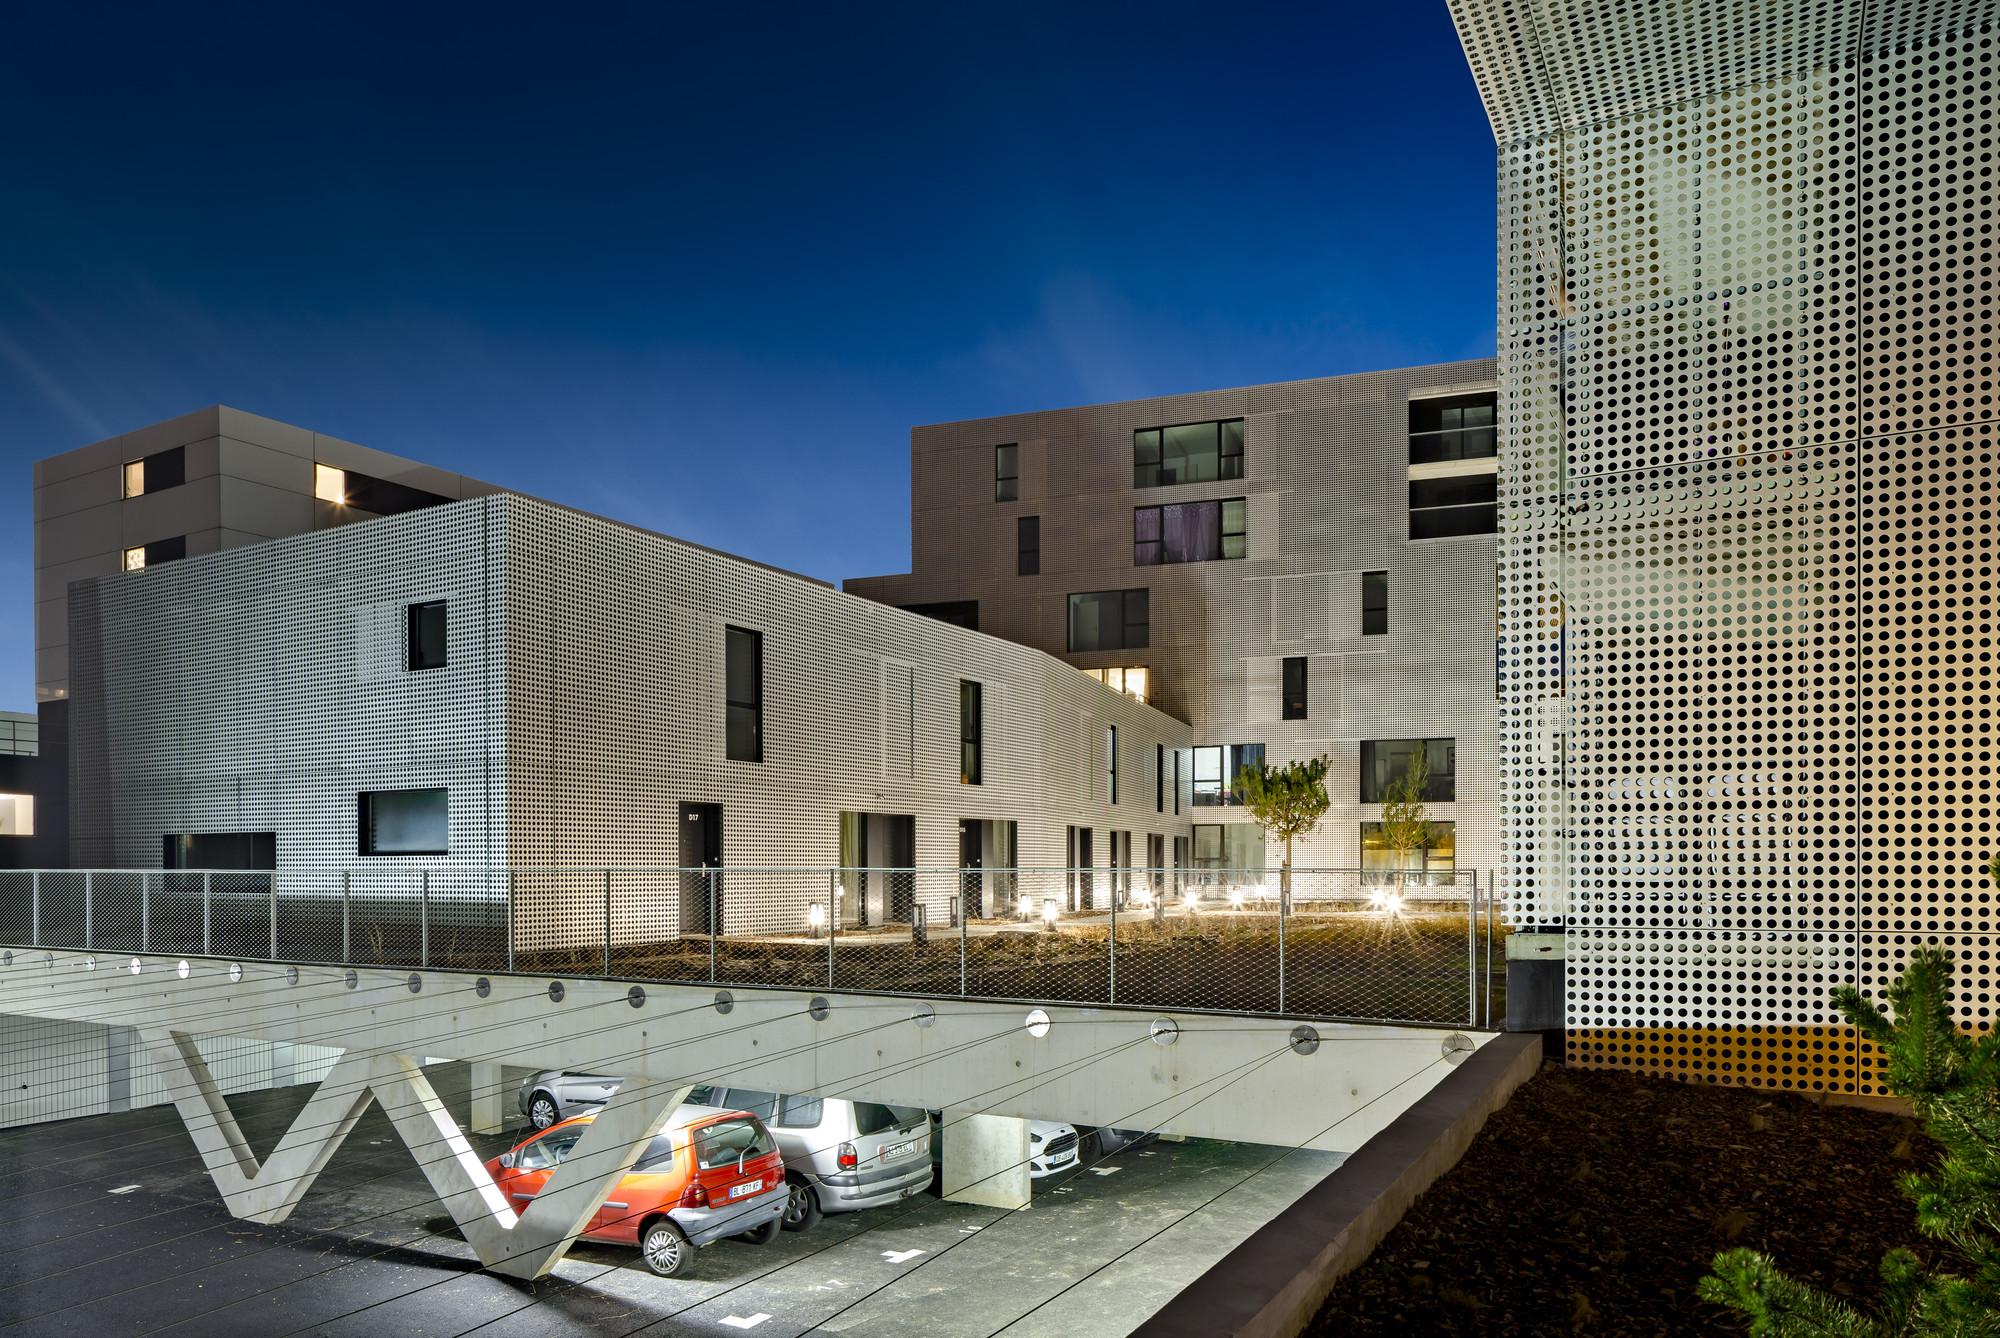 gallery of le havre cote docks vauban philippe dubus architecte 23. Black Bedroom Furniture Sets. Home Design Ideas